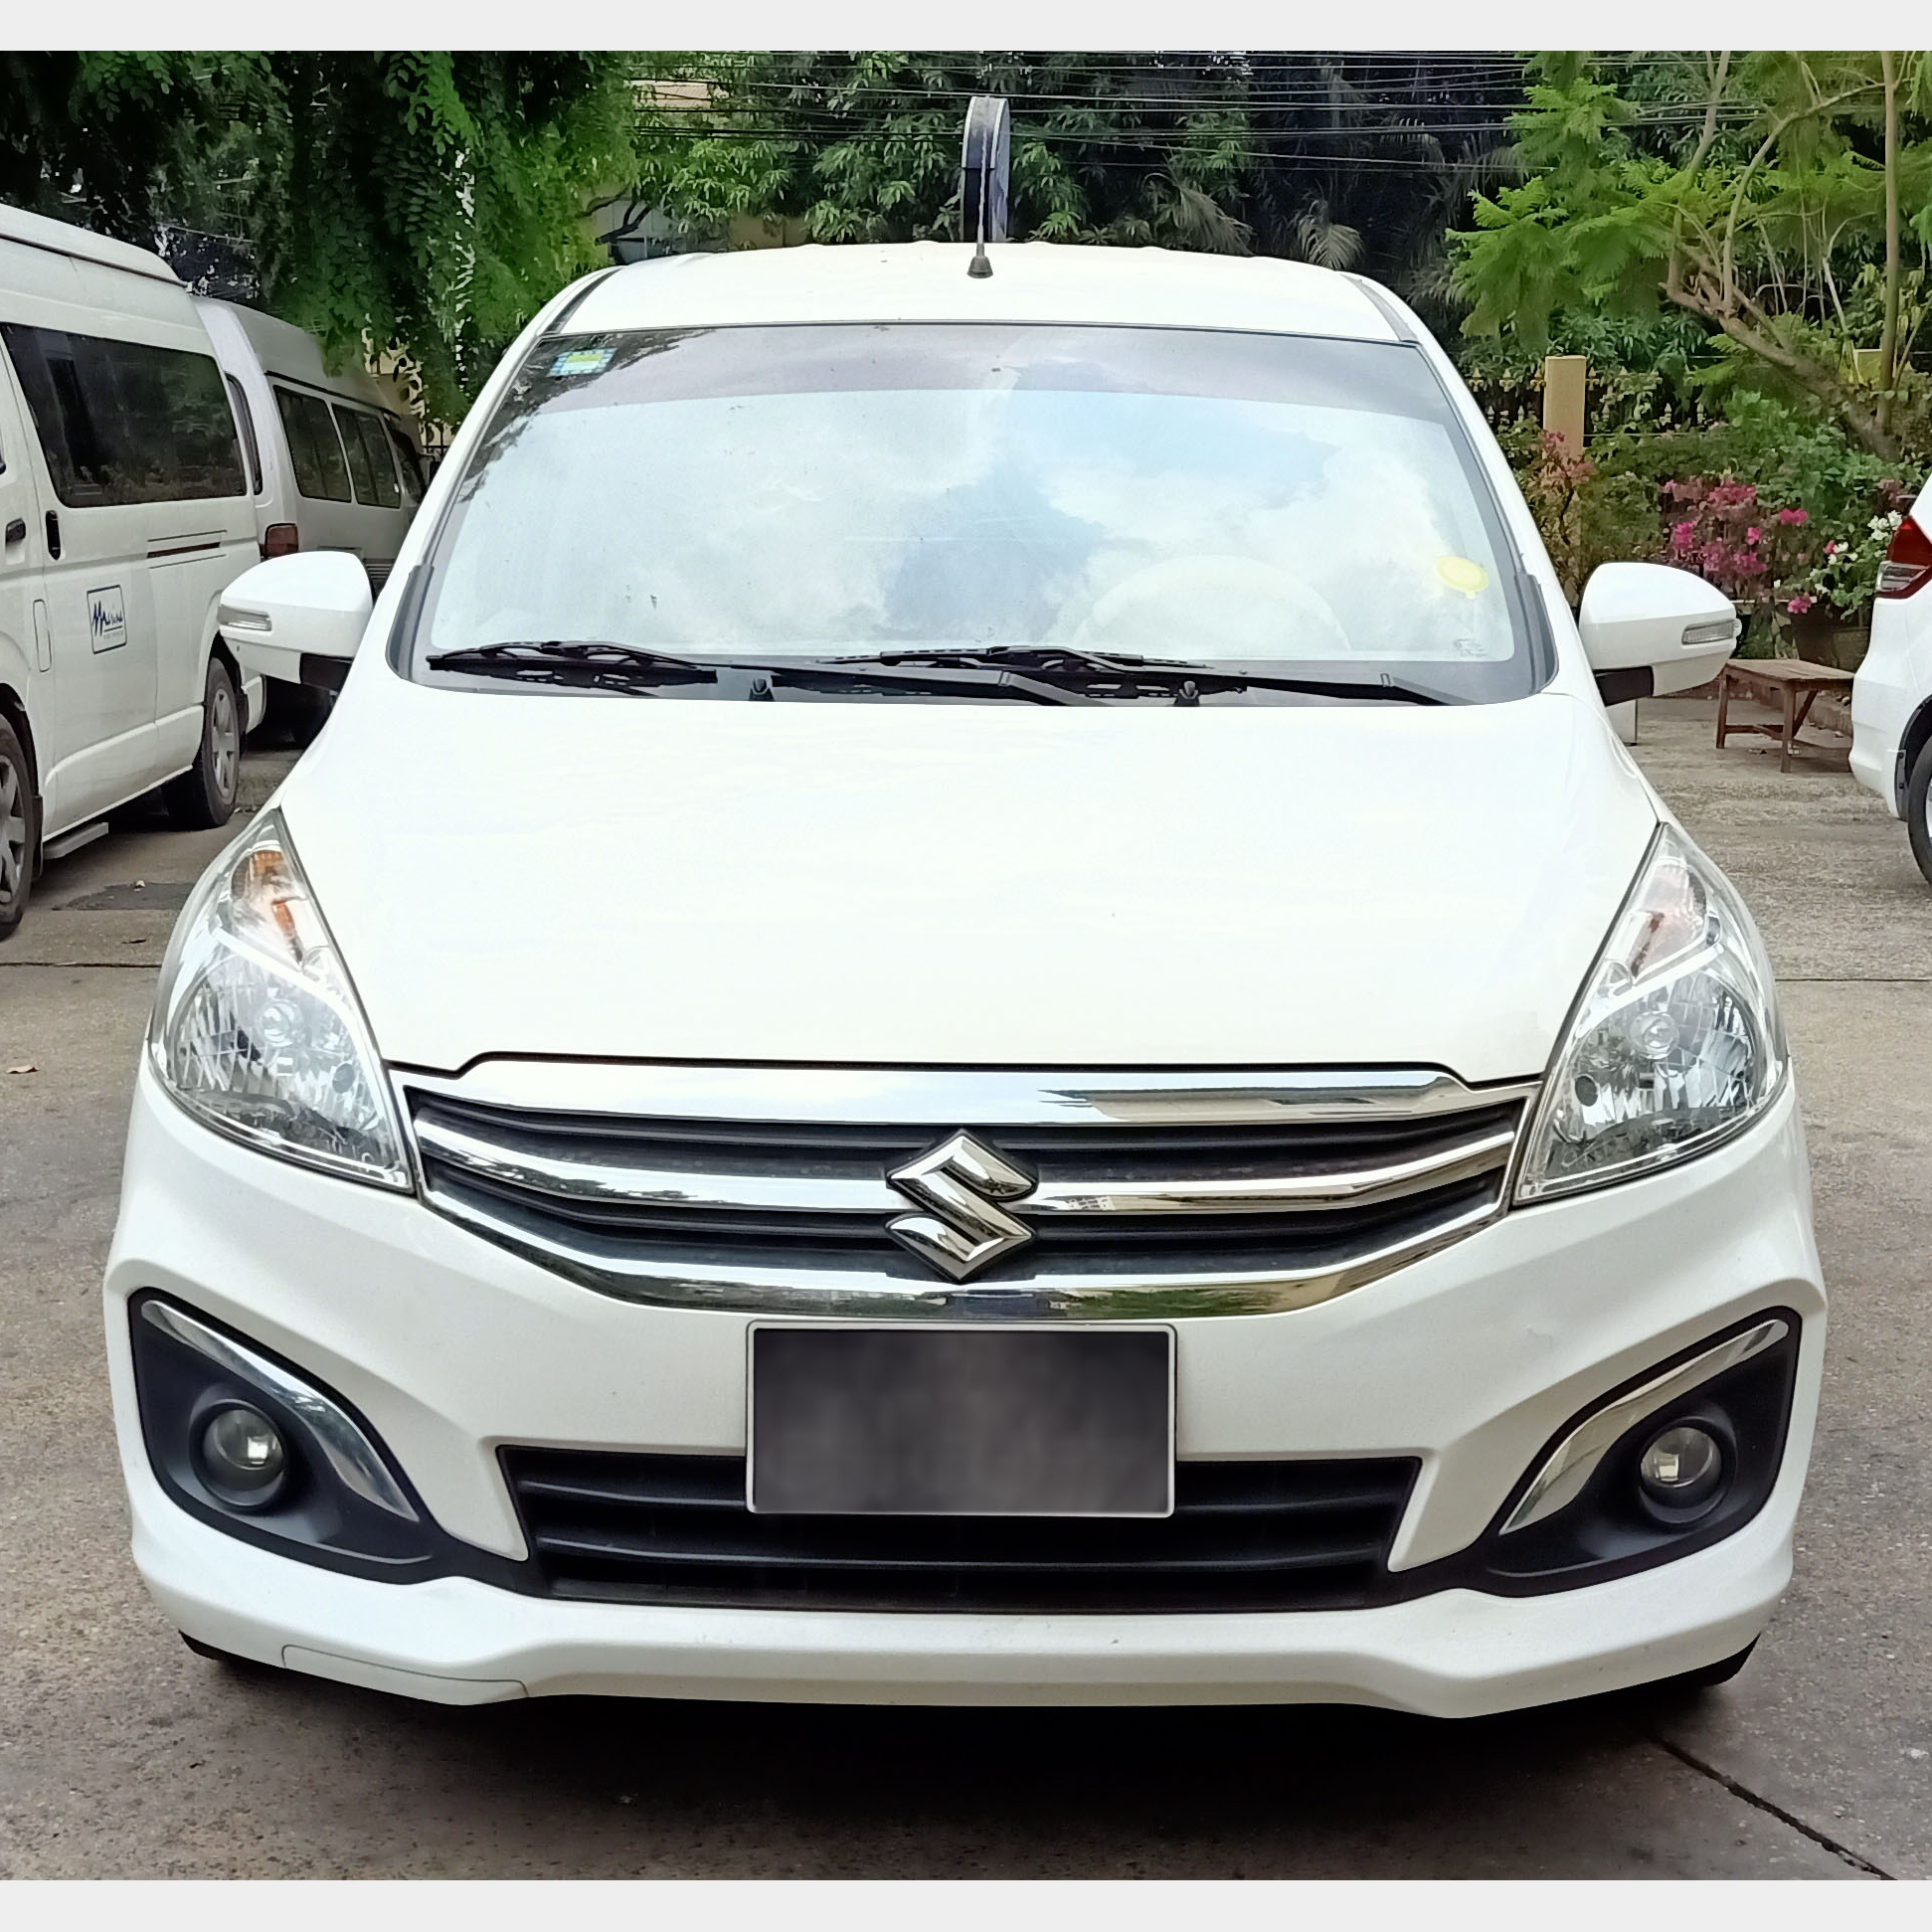 Suzuki Ertiga 2018  Image, ဗန် classified, Myanmar marketplace, Myanmarkt